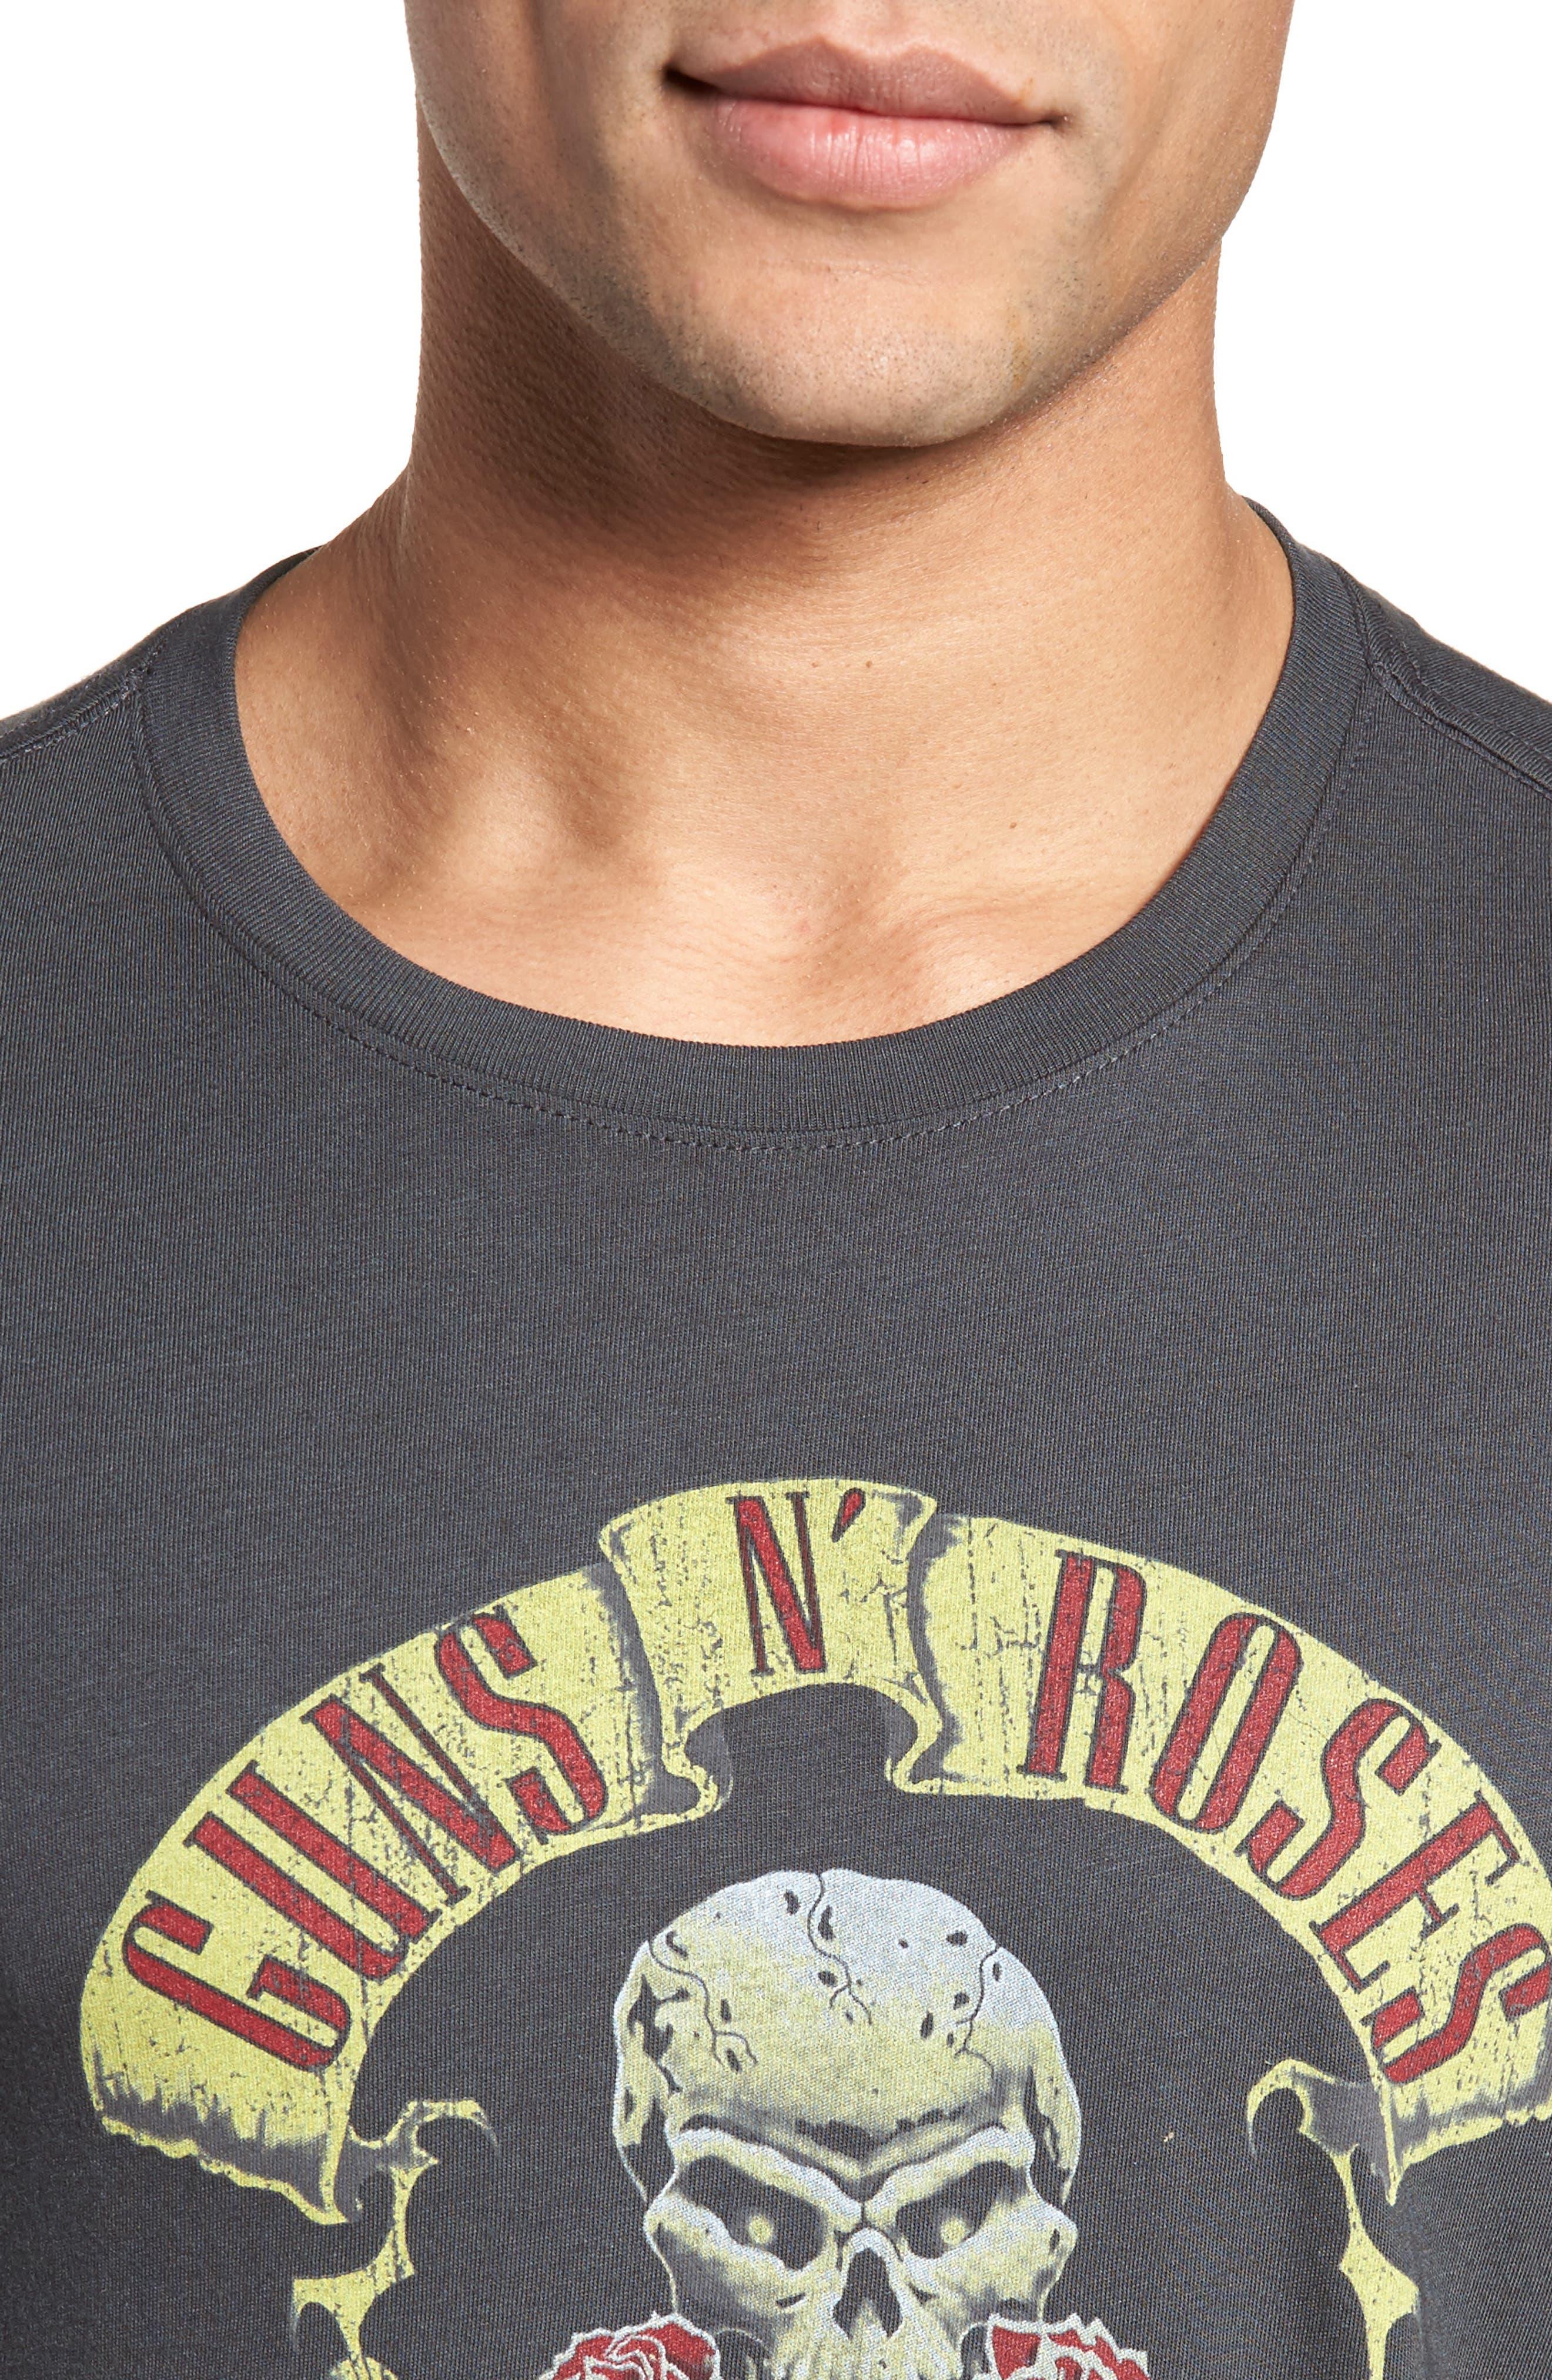 Guns N' Roses Graphic T-Shirt,                             Alternate thumbnail 4, color,                             Coal